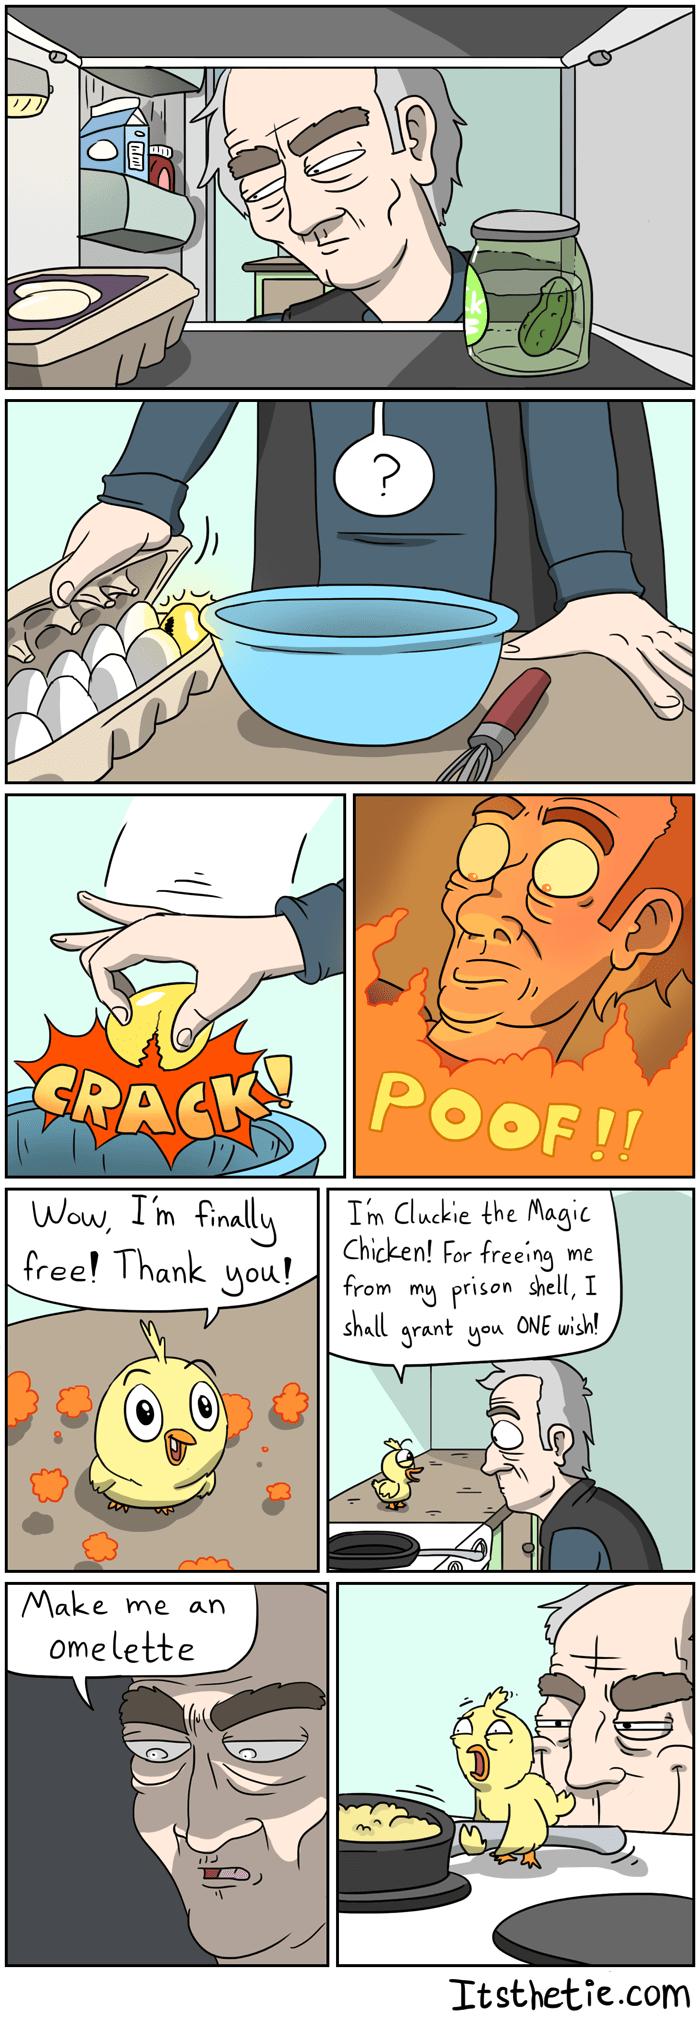 web-comics-chicken-making-eggs-quick-escalation